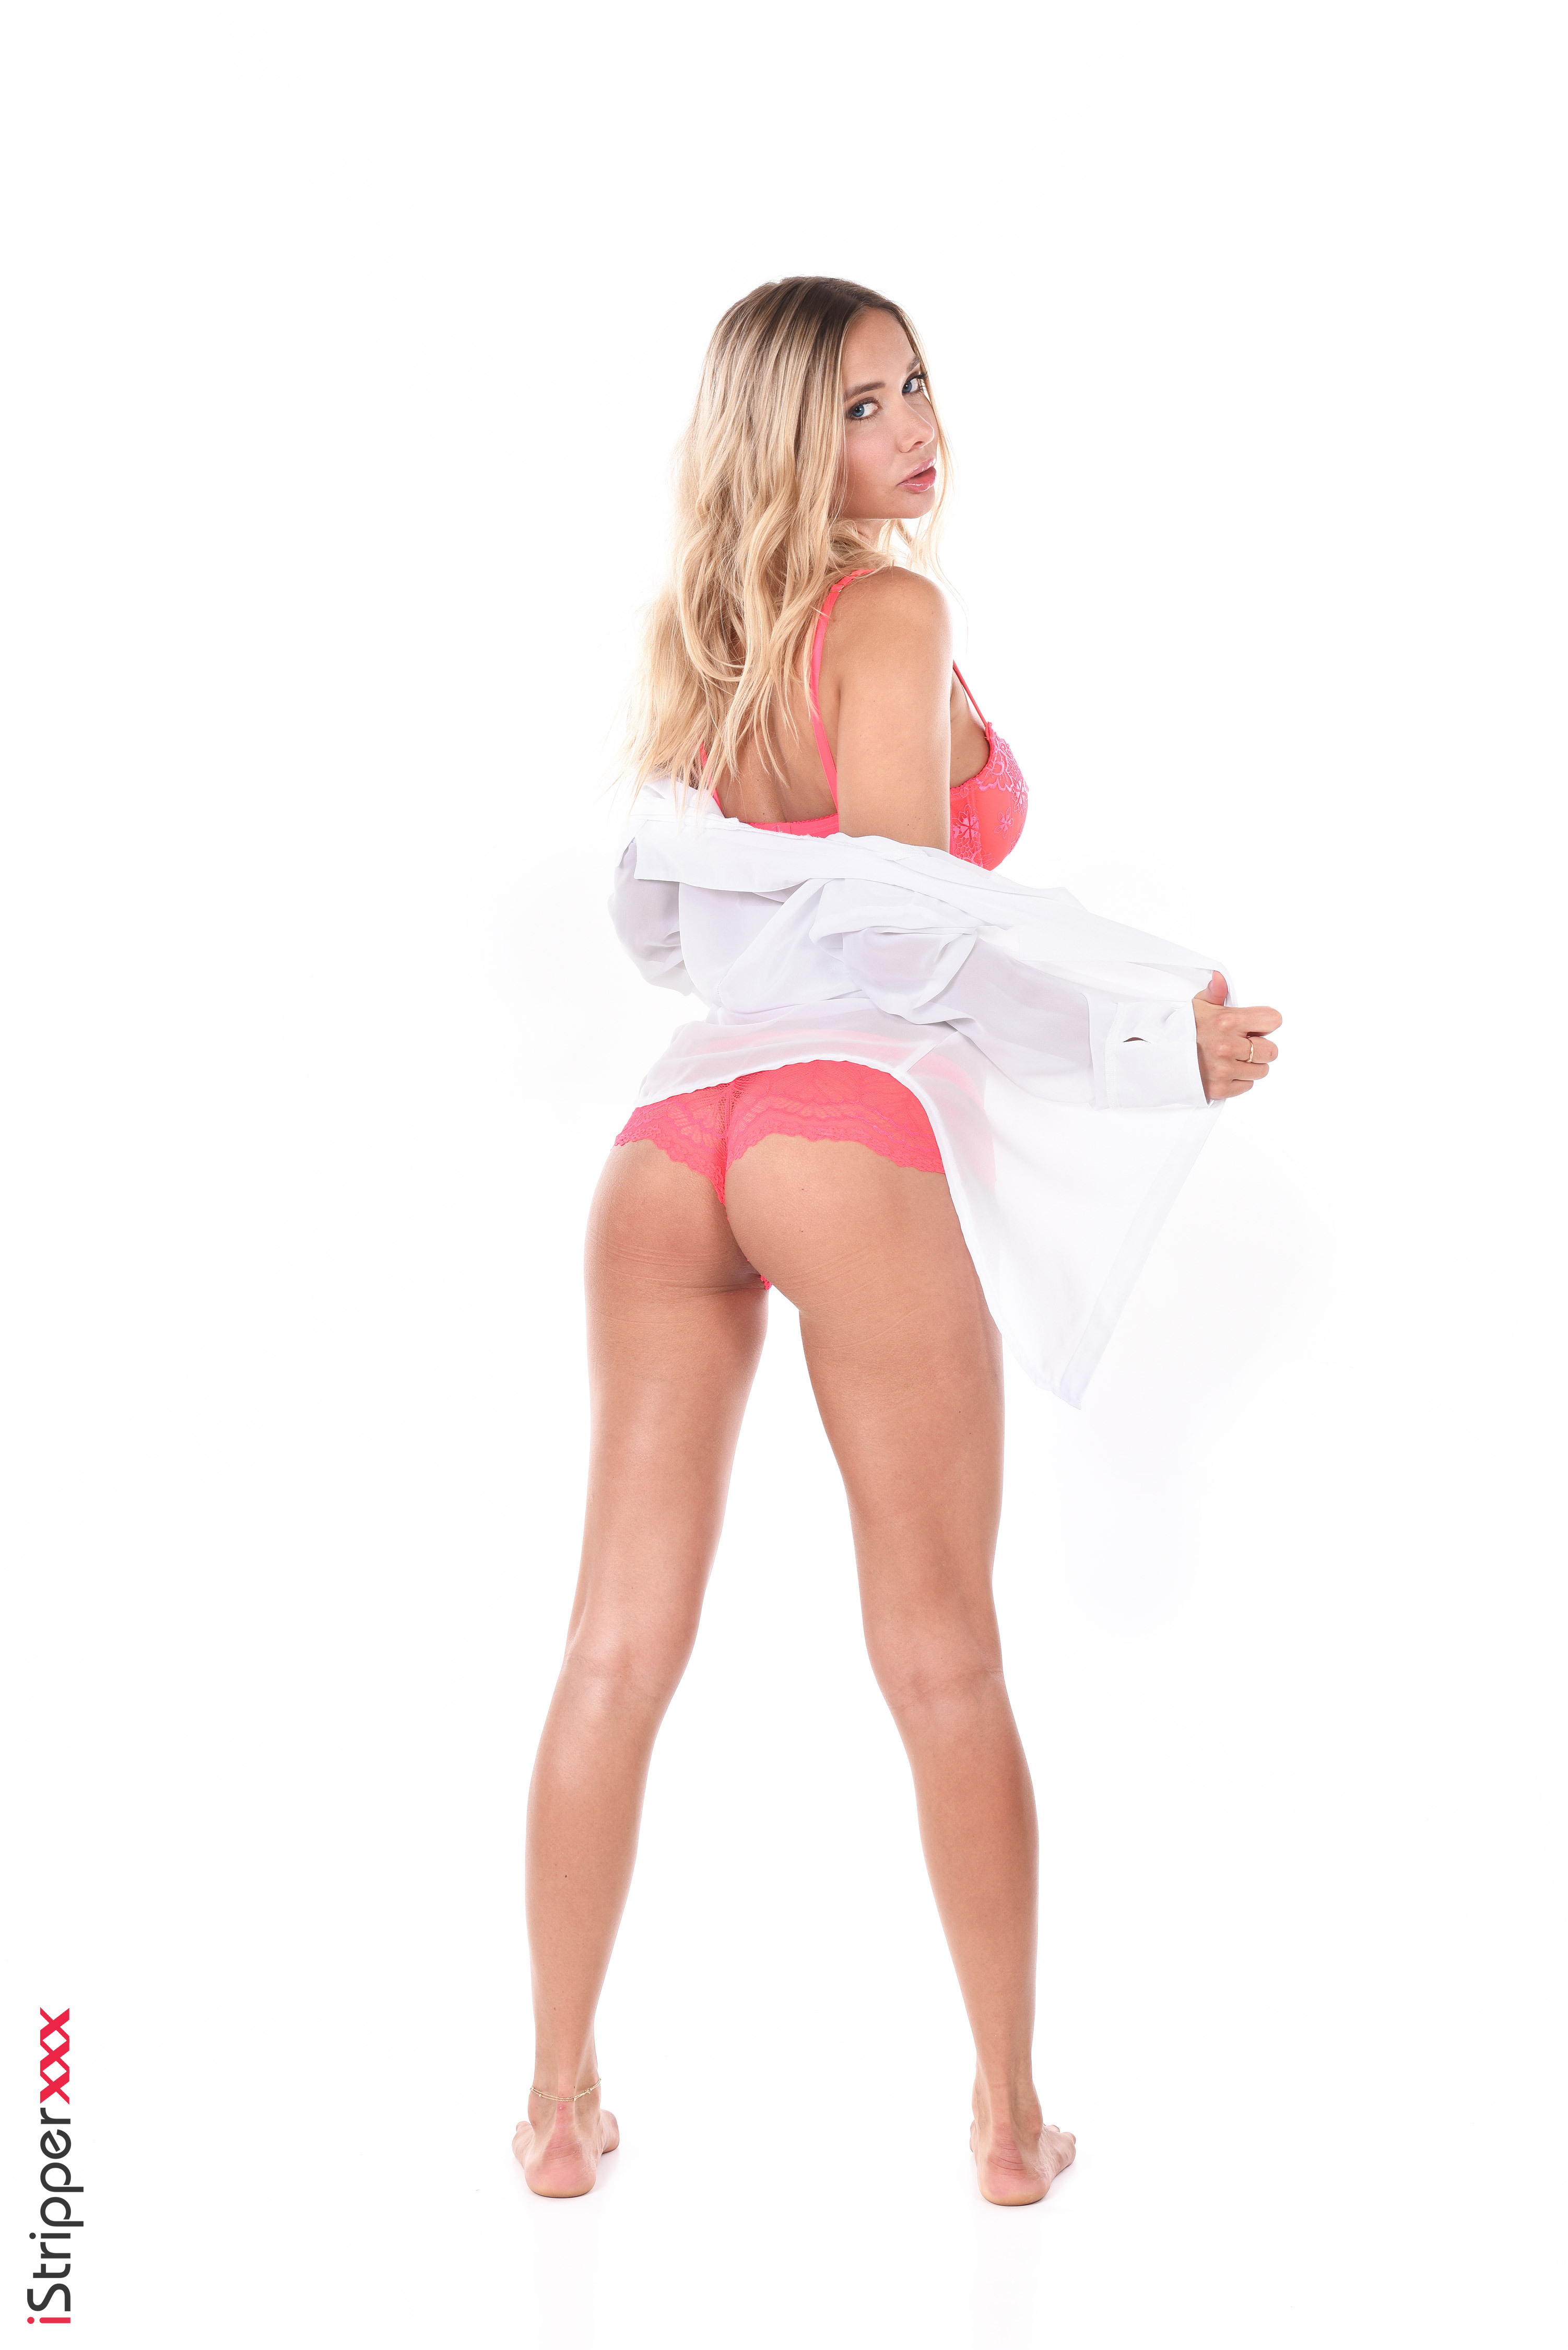 blonde erotic nude